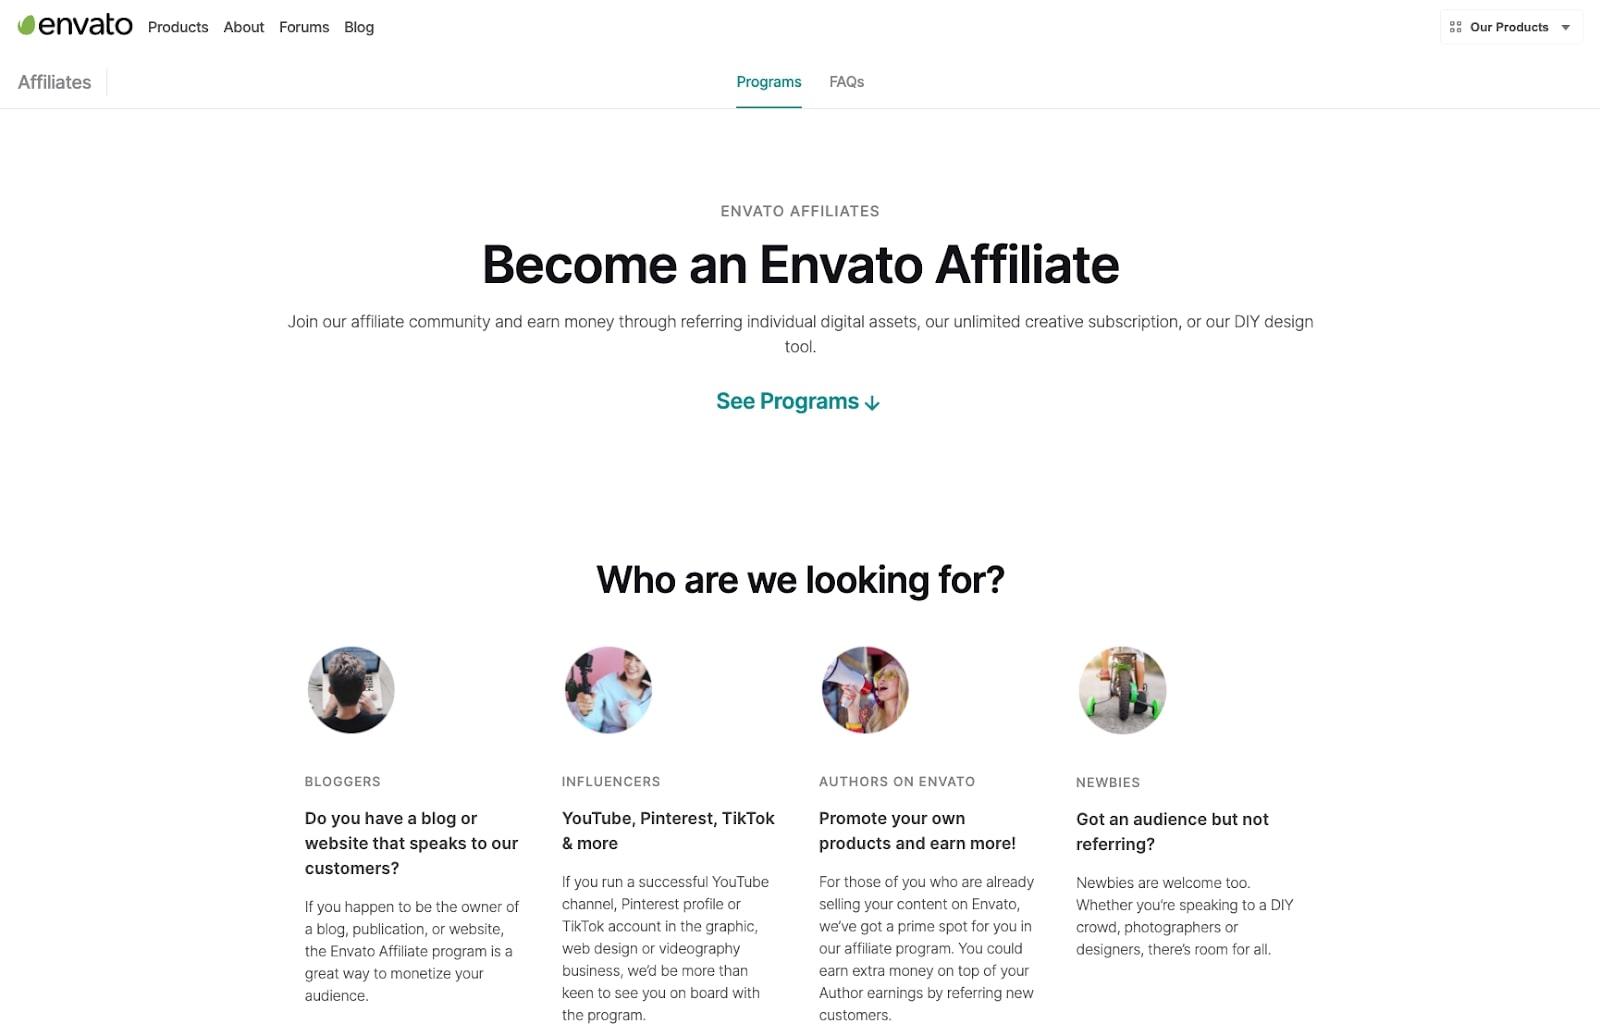 Screenshot of Envato affiliate program website